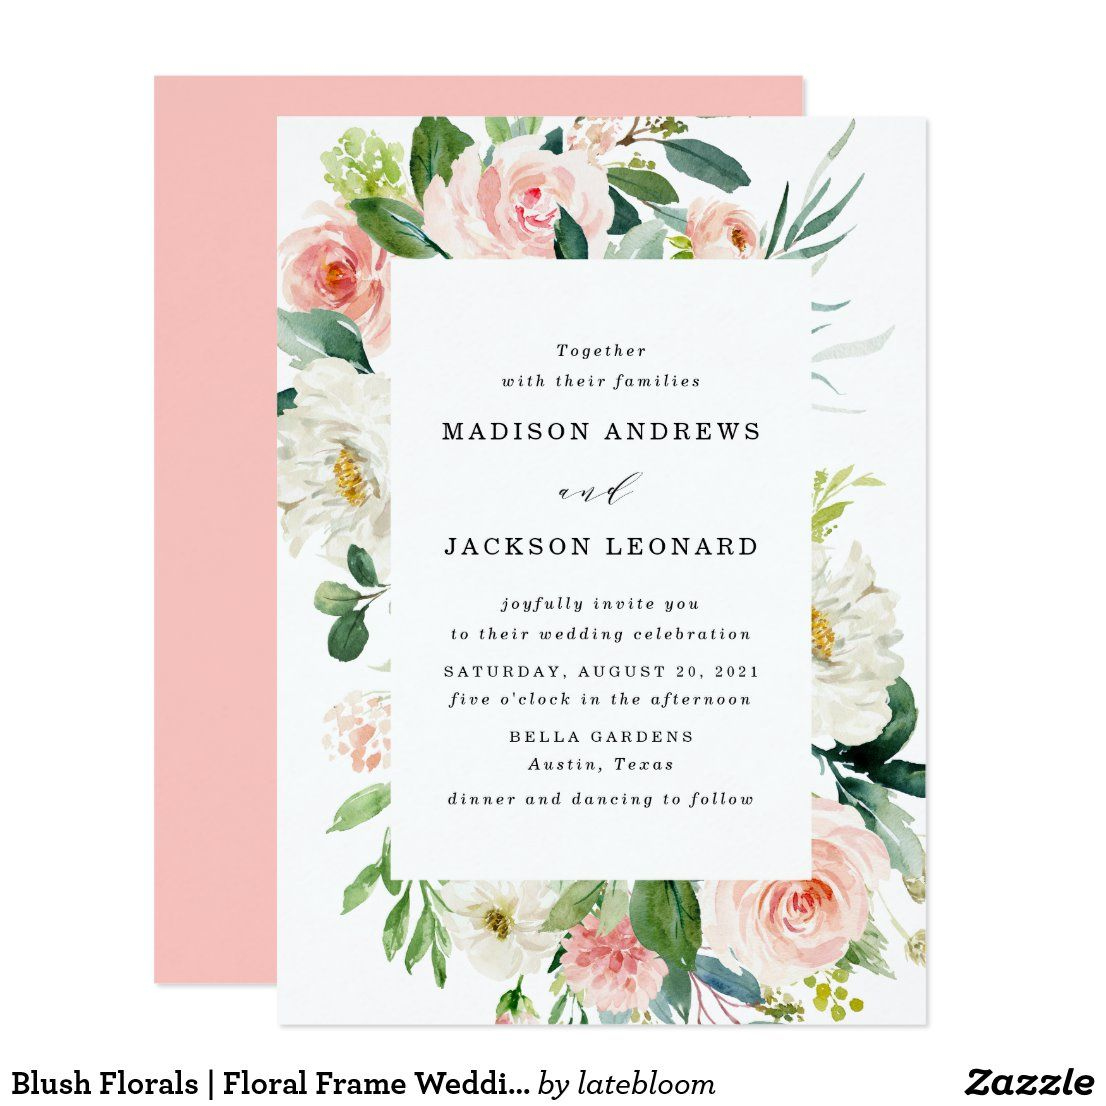 Blush Florals | Floral Frame Wedding Invitation | Zazzle.com in 2020 |  Watercolor floral wedding invitations, Floral wedding, Watercolor bridal  shower invitations